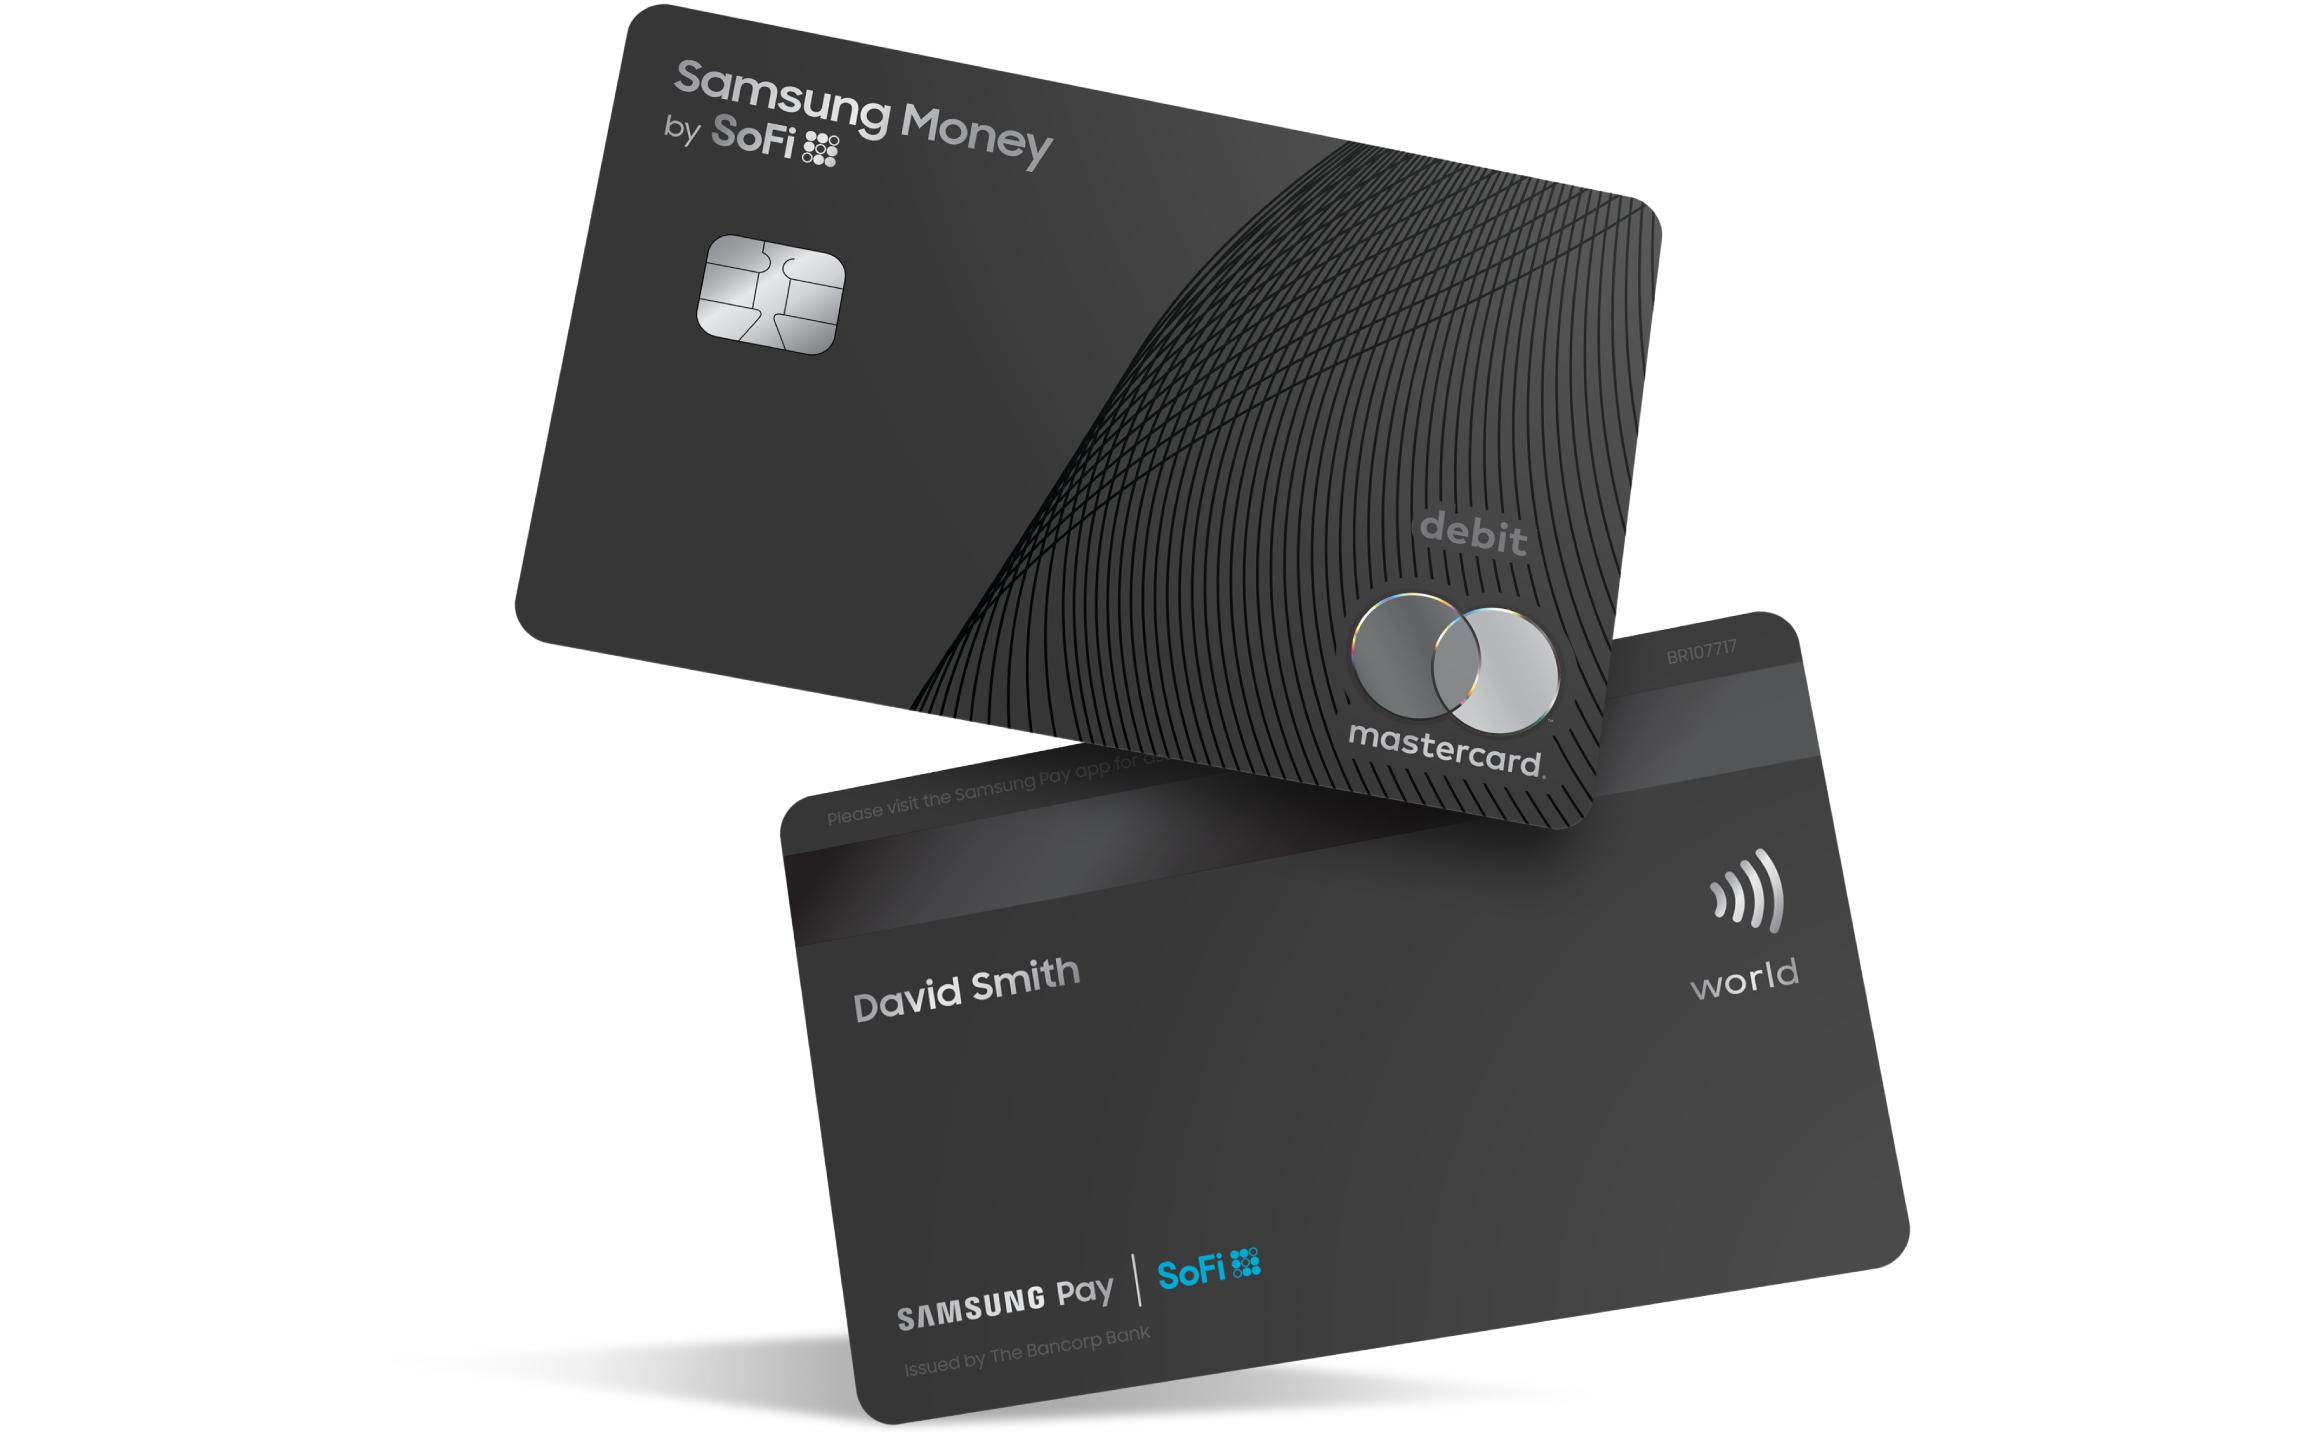 samsung_money_card